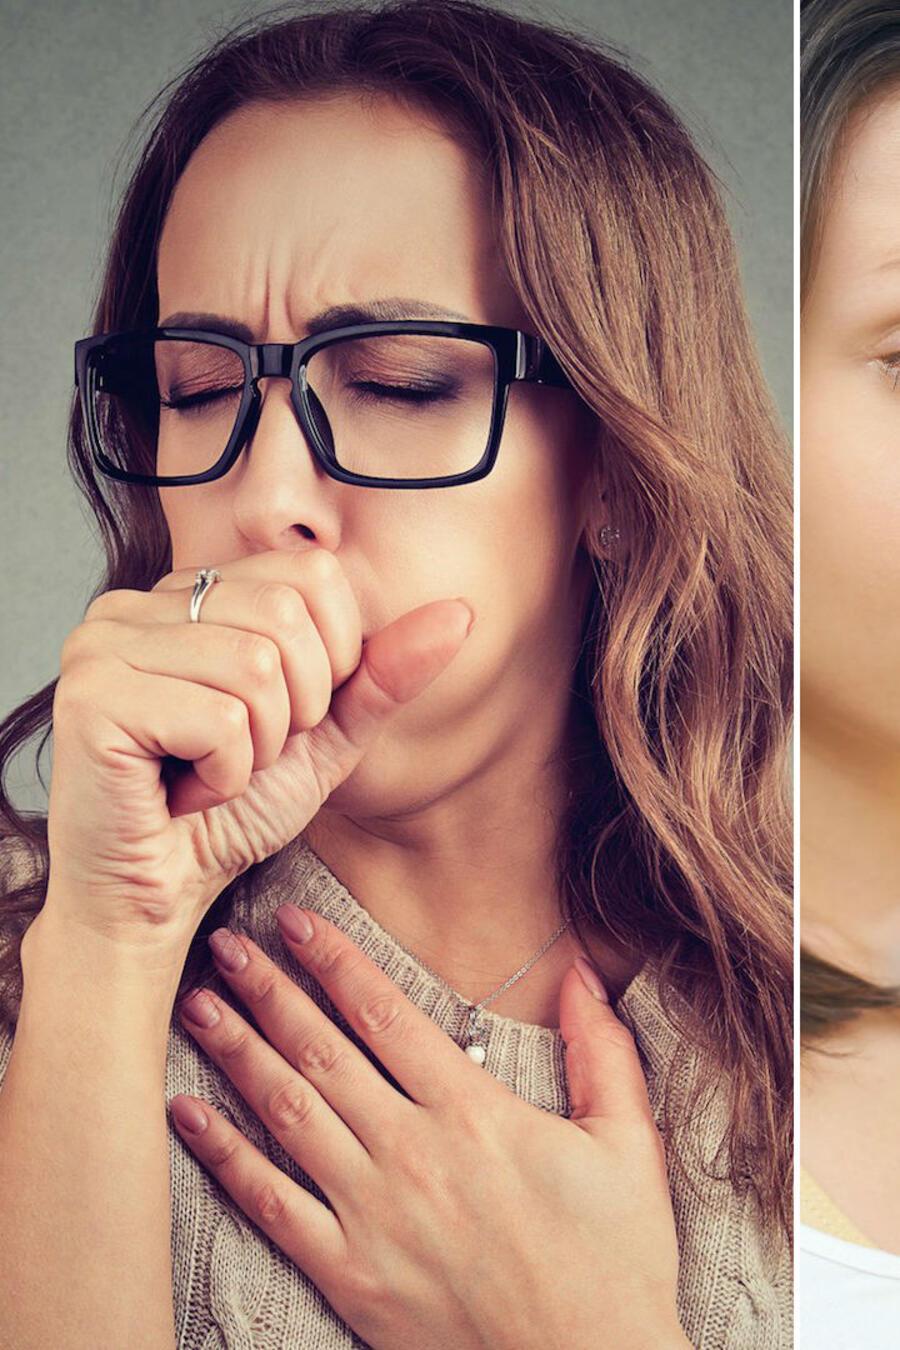 Mujer tosiendo, mujer pesándose y mujer bostezando